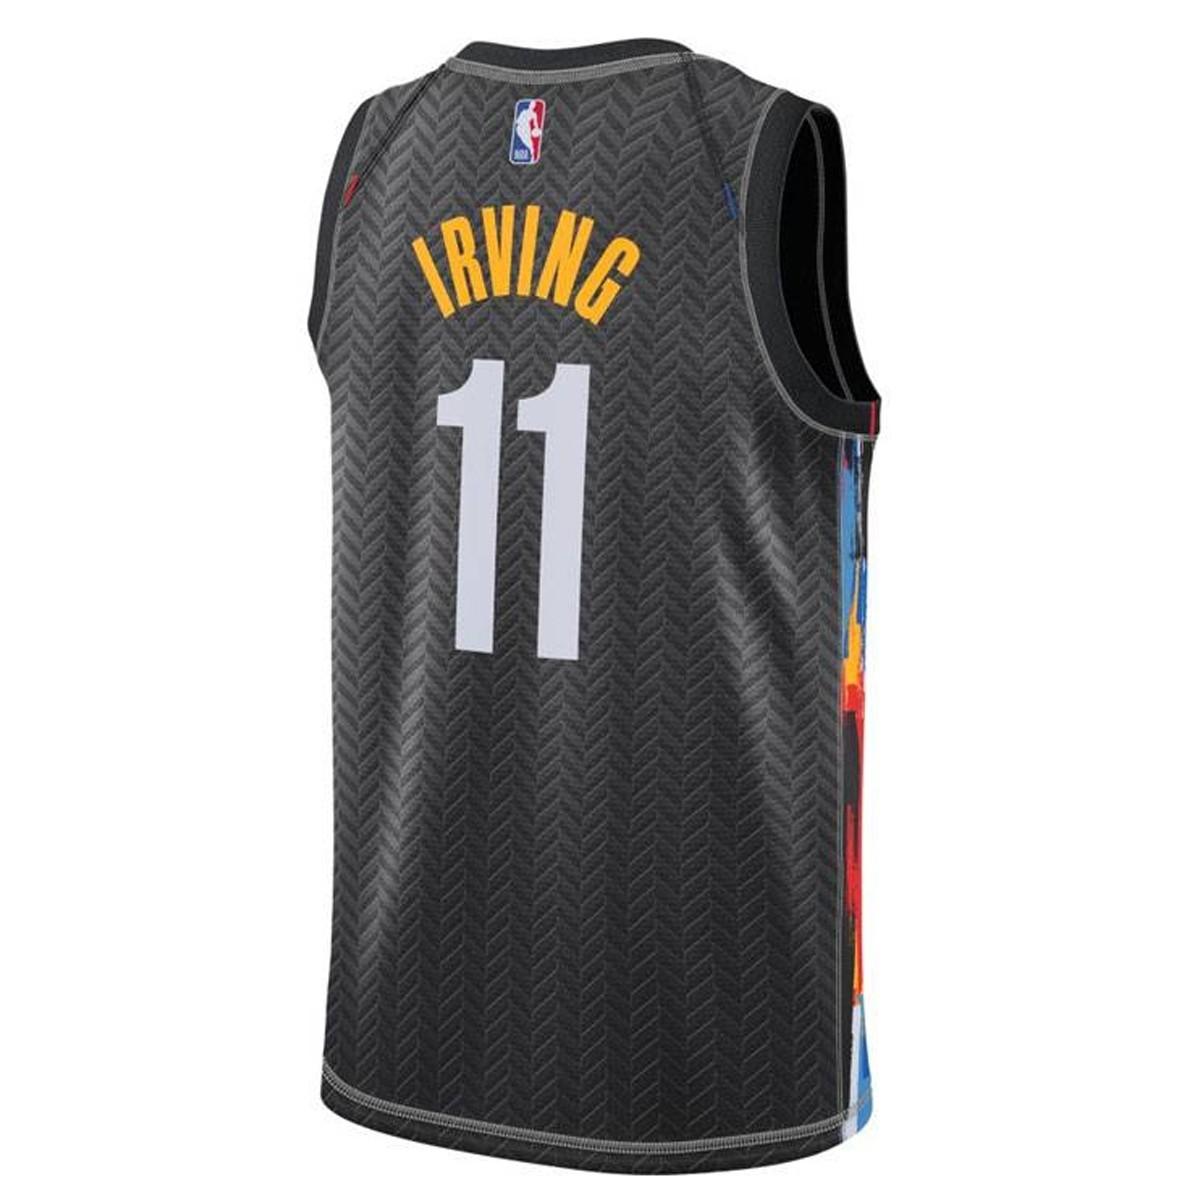 Nike Jr NBA Brooklyn Nets Swingman Jersey Kyrie Irving 'City Edition'-EZ2B7BXCP-NYNKI